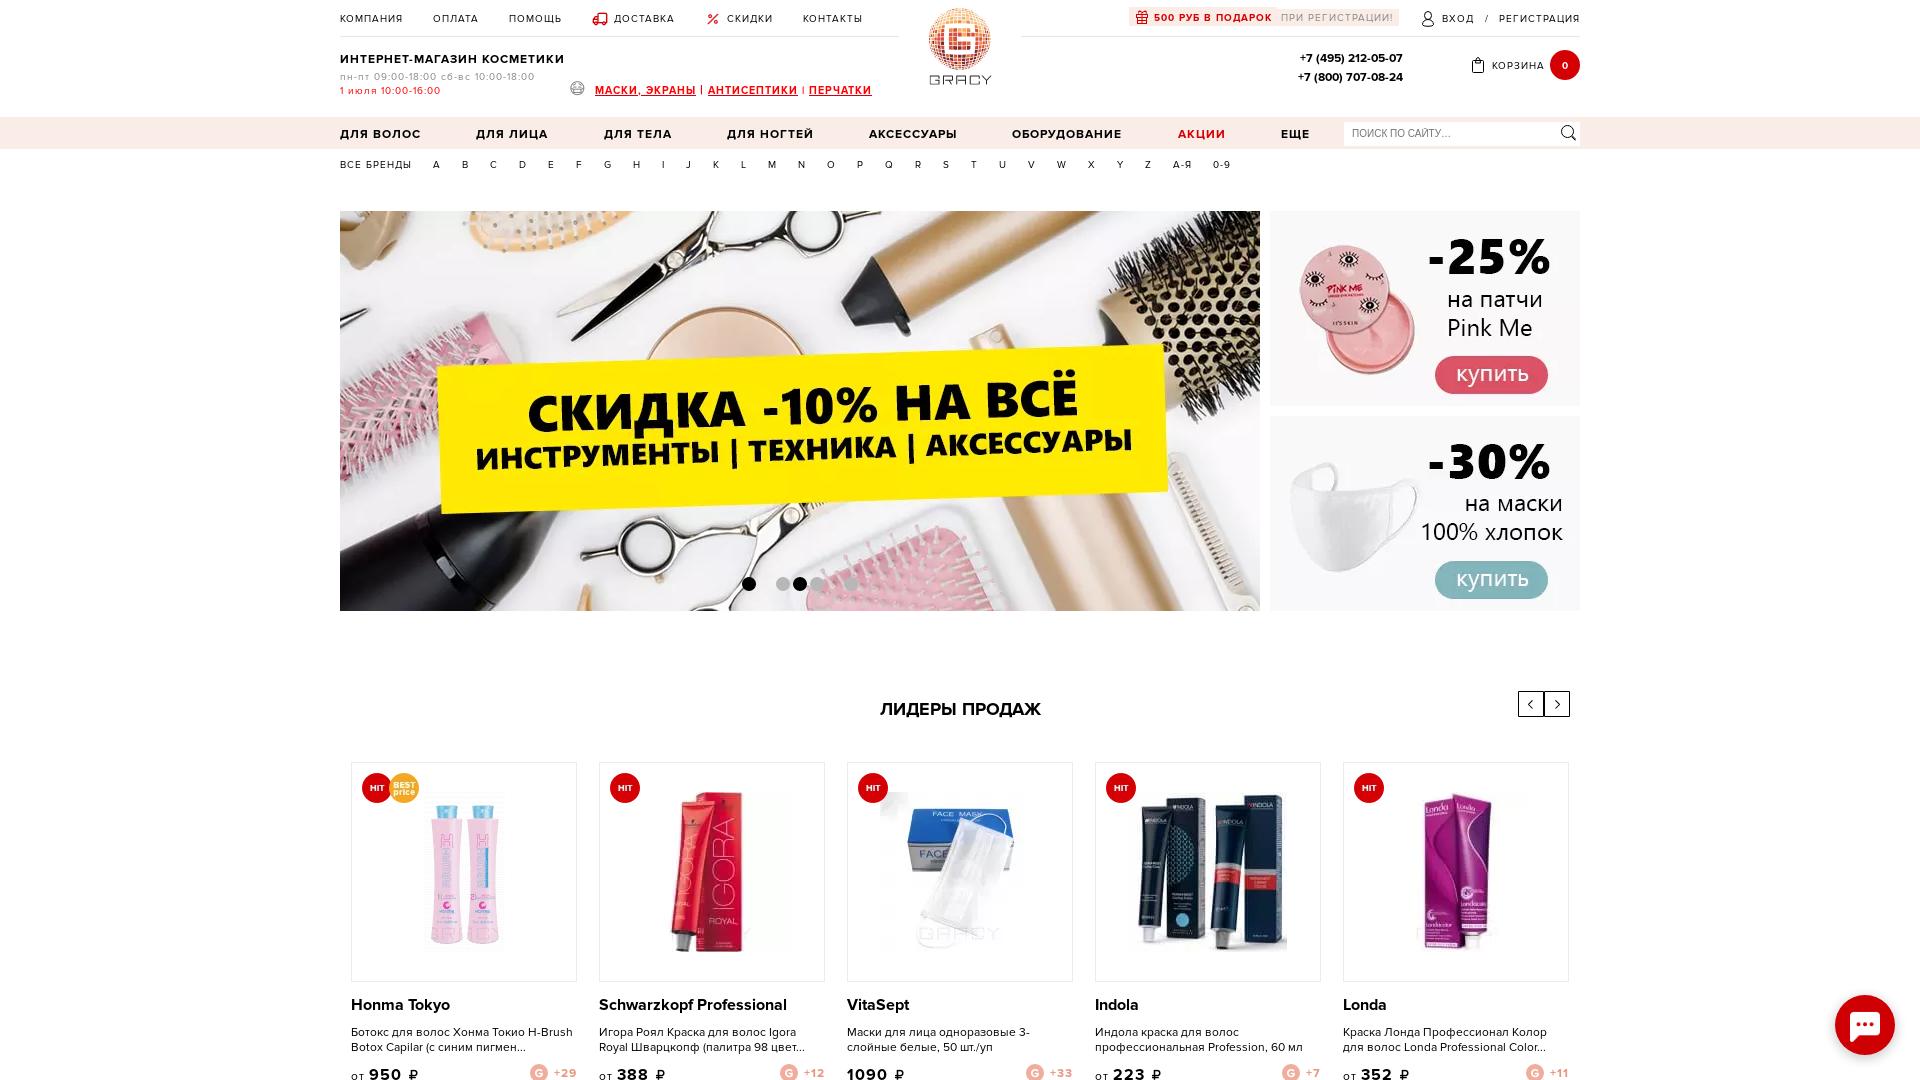 Gracy website